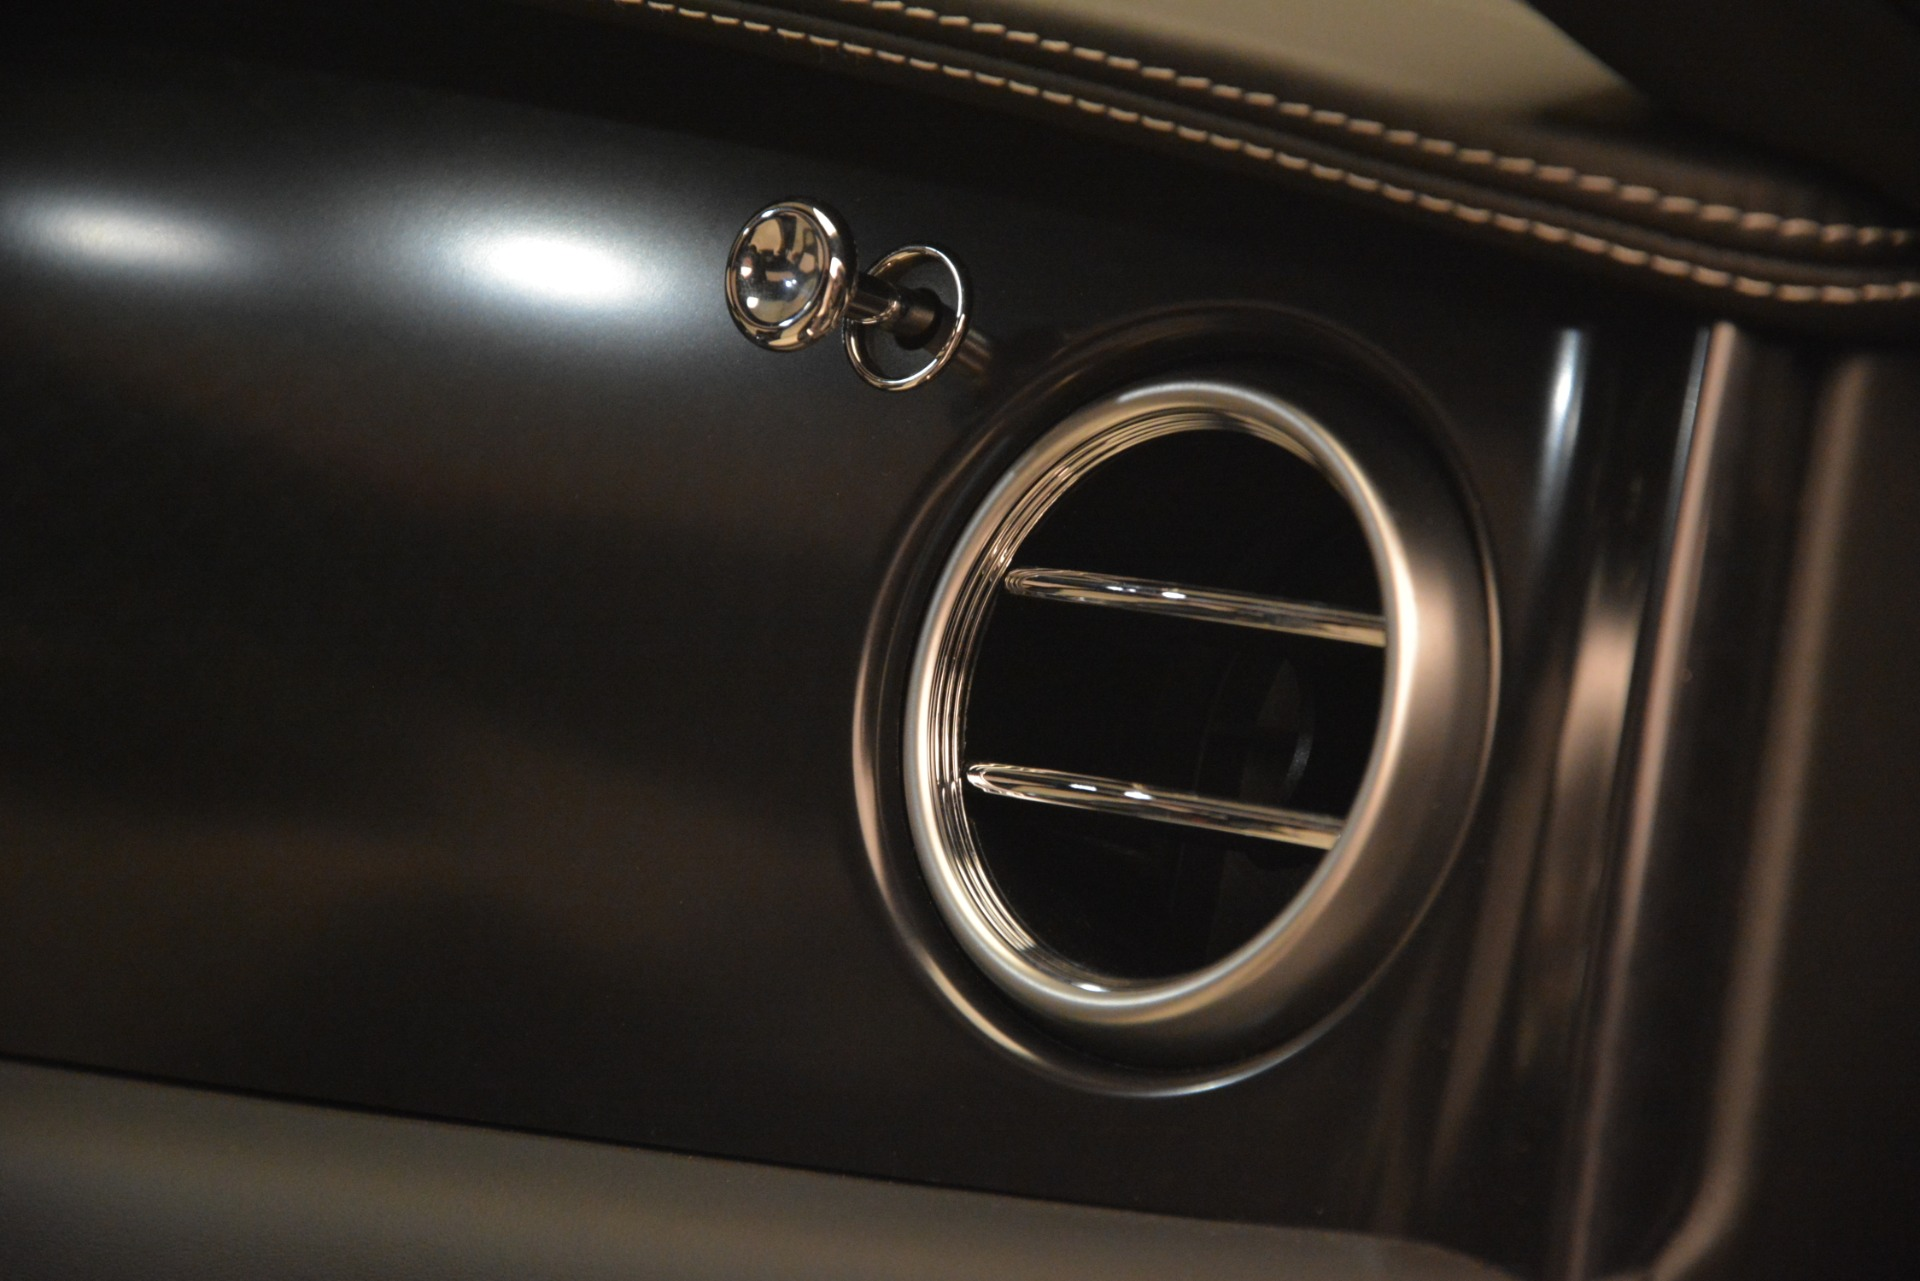 Used 2018 Bentley Flying Spur W12 S For Sale In Westport, CT 3014_p23